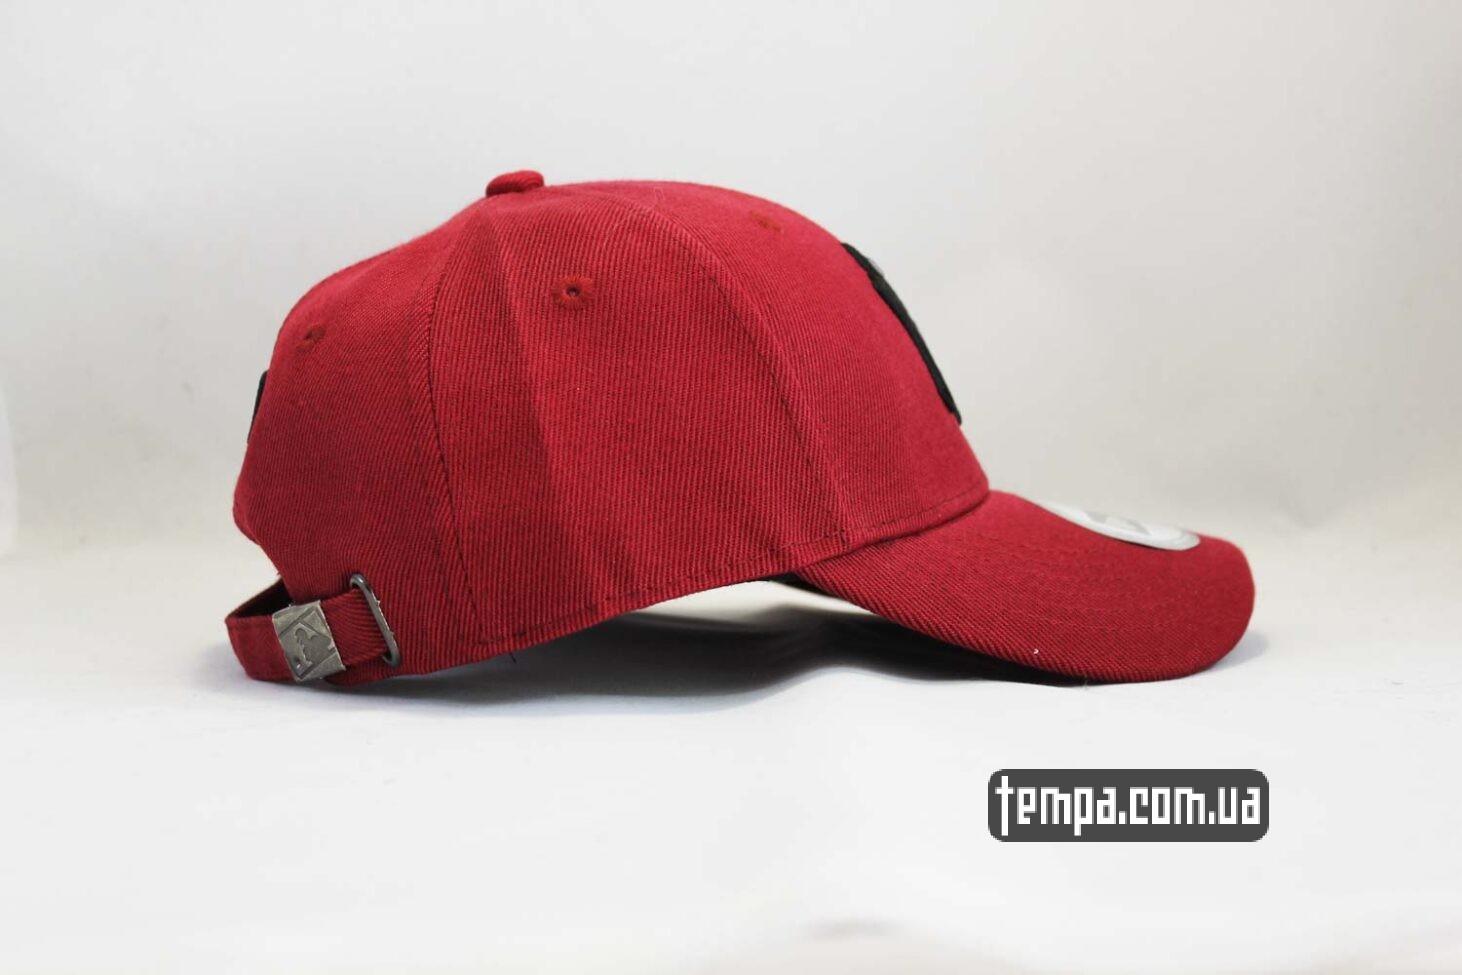 темно-бордовая кепка бейсболка Янки Yankees New York New Era красая